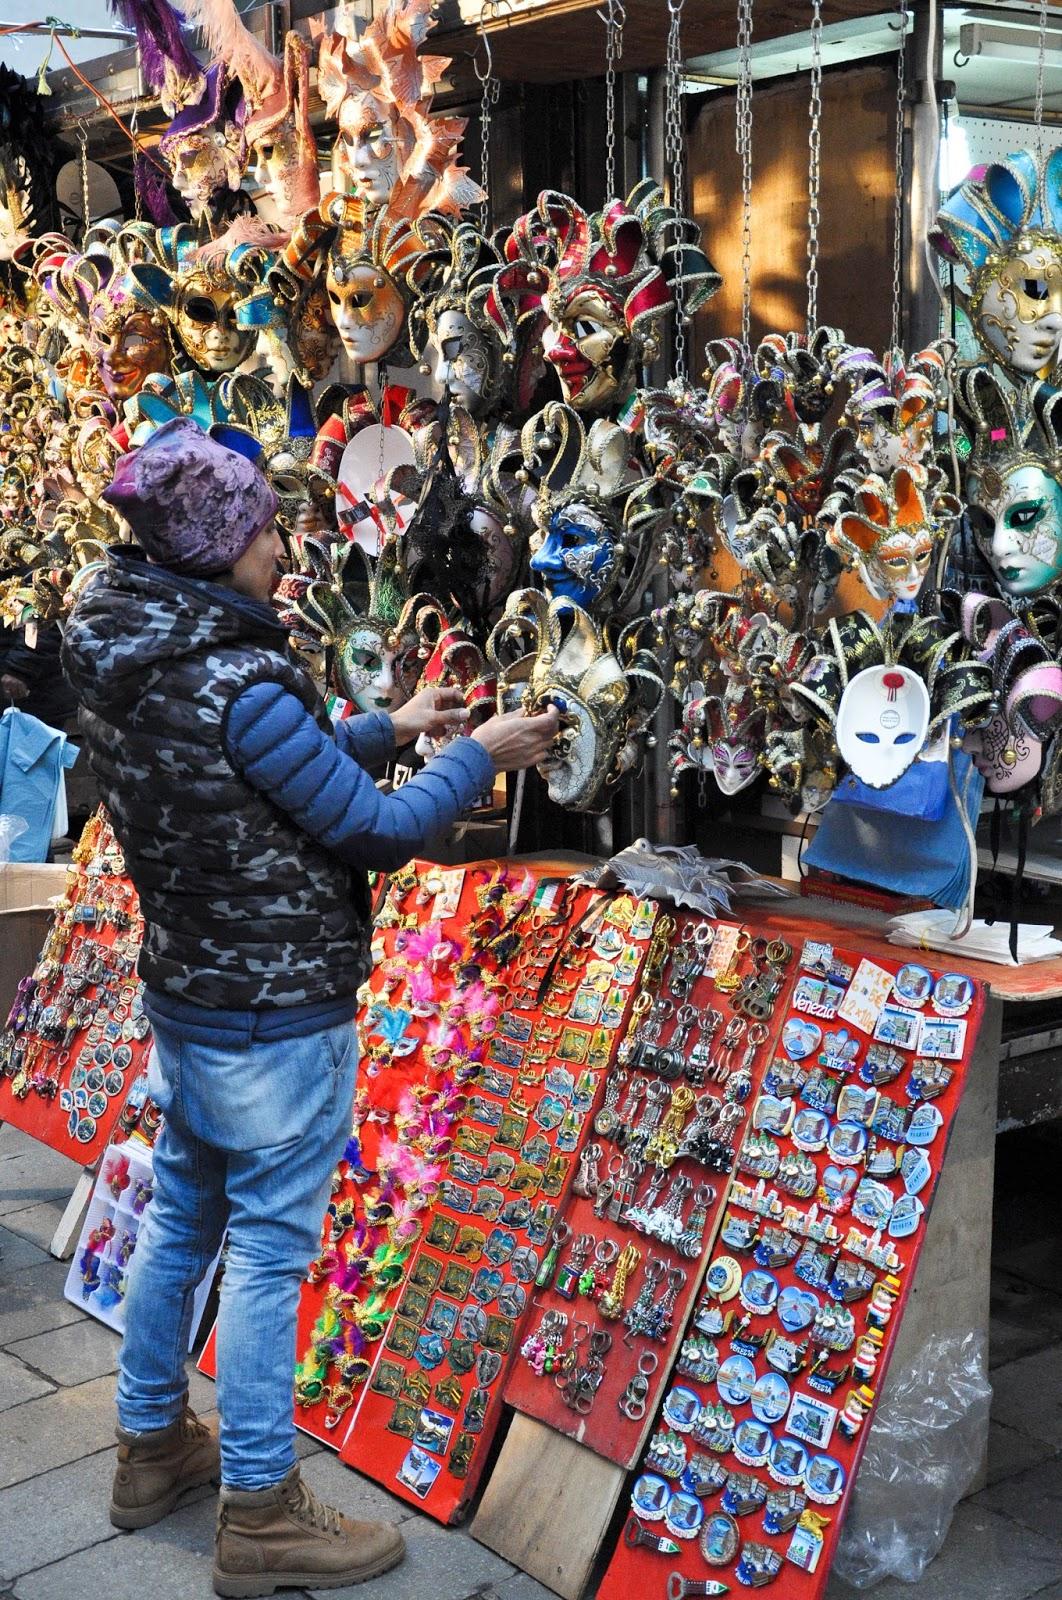 Setting up a cheap souvenir stall, Venice, Italy